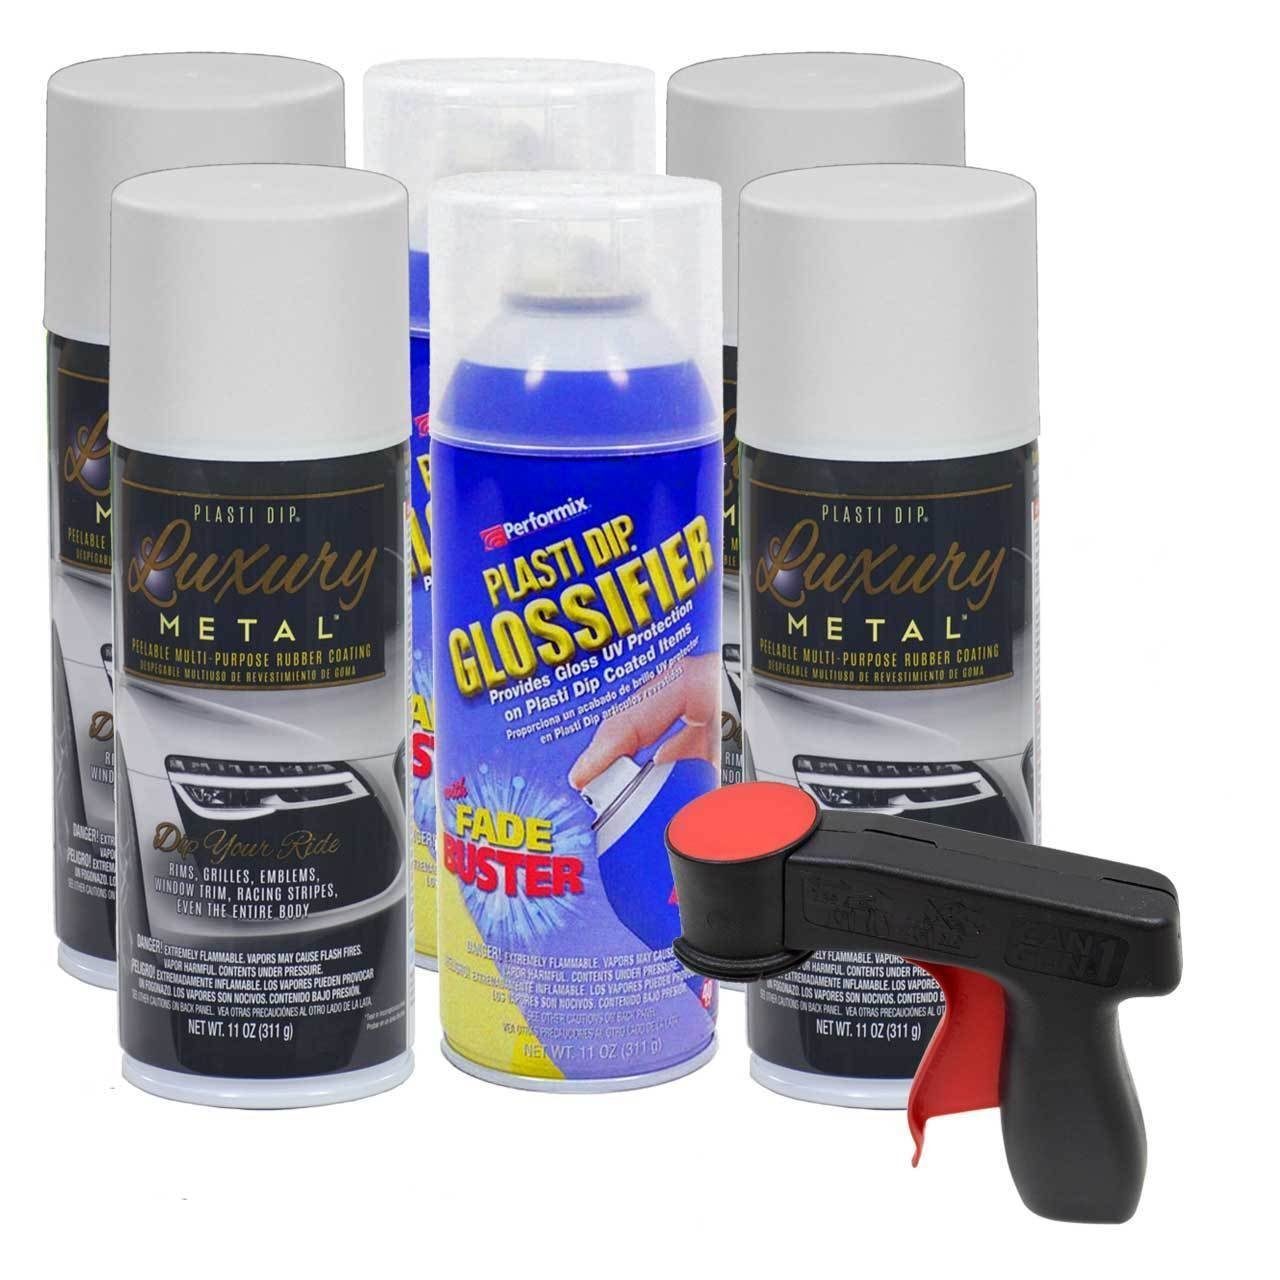 Plasti Dip Rim Kit: 4 Aerosol Cans Luxury Glacier White Metallic, 2 Aerosol Cans Glossifier, 1 Cangun ...